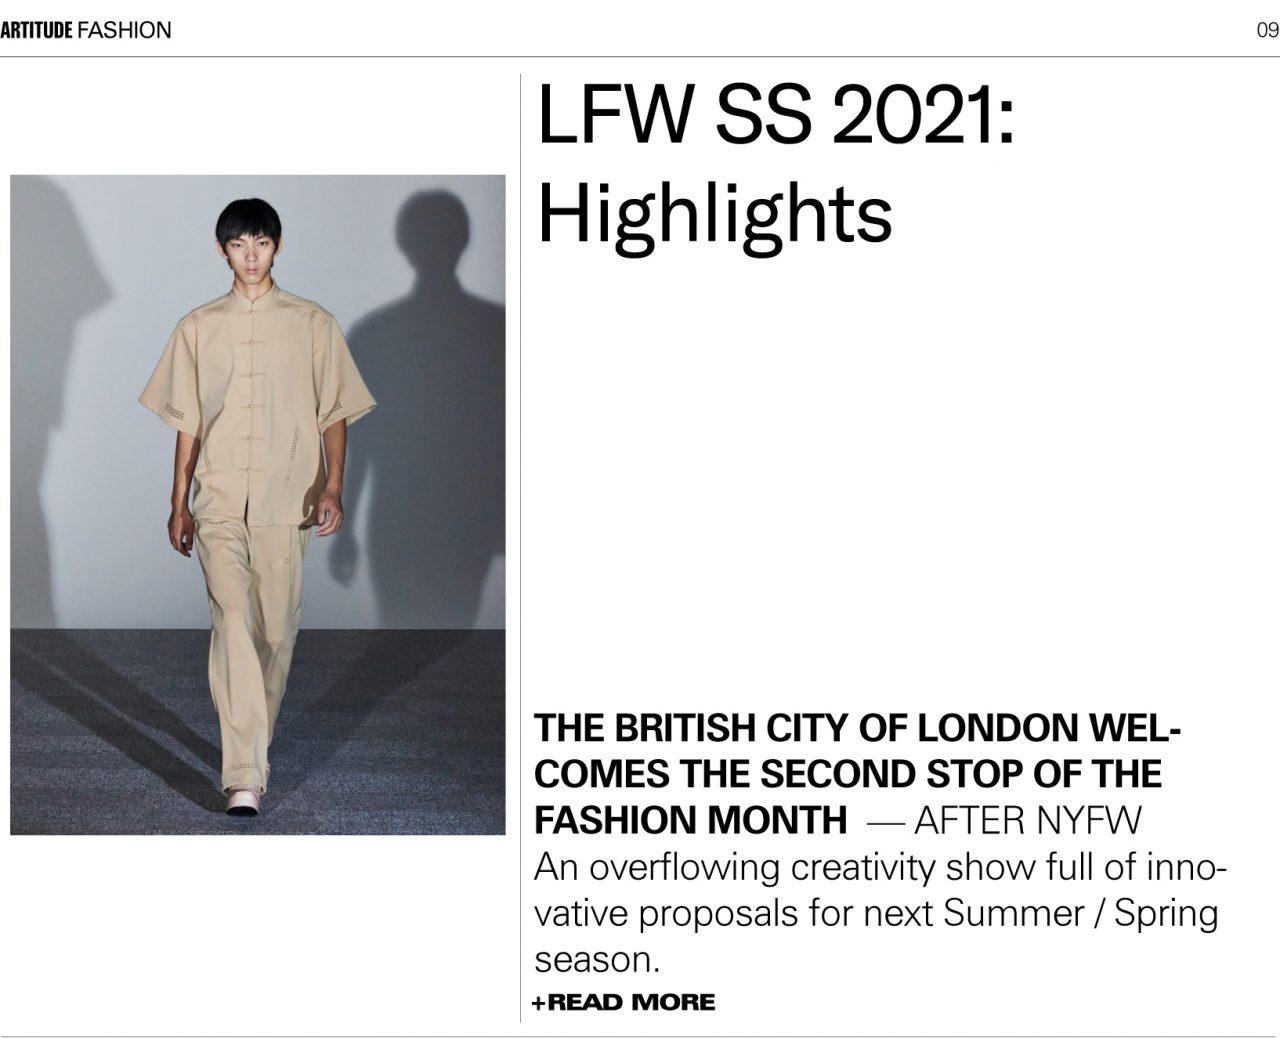 LONDON FASHION WEEK 2021 S/S